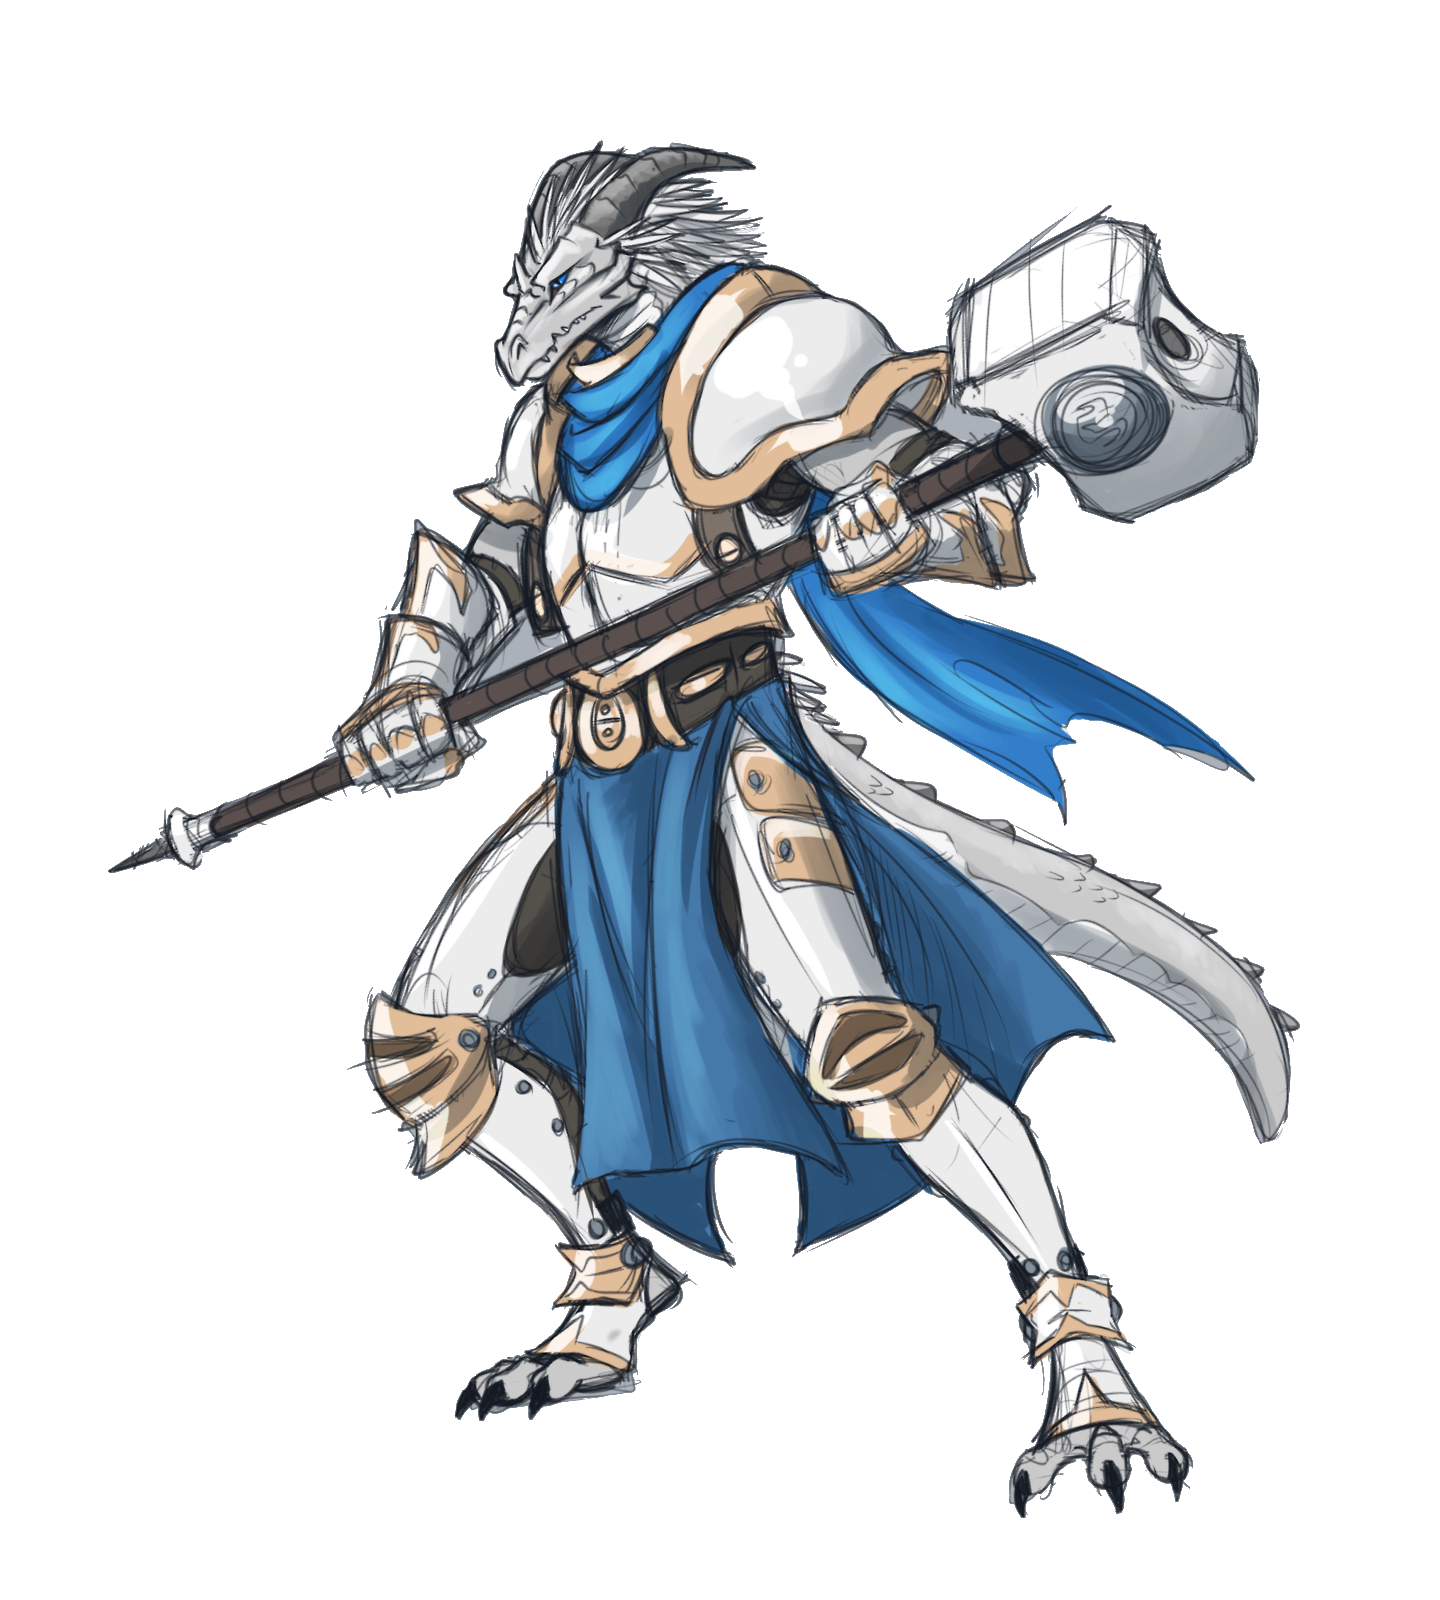 Male Silver Dragonborn Paladin Knight - Pathfinder PFRPG DND D&D 3.5 5E 5th ed d20 fantasy ...